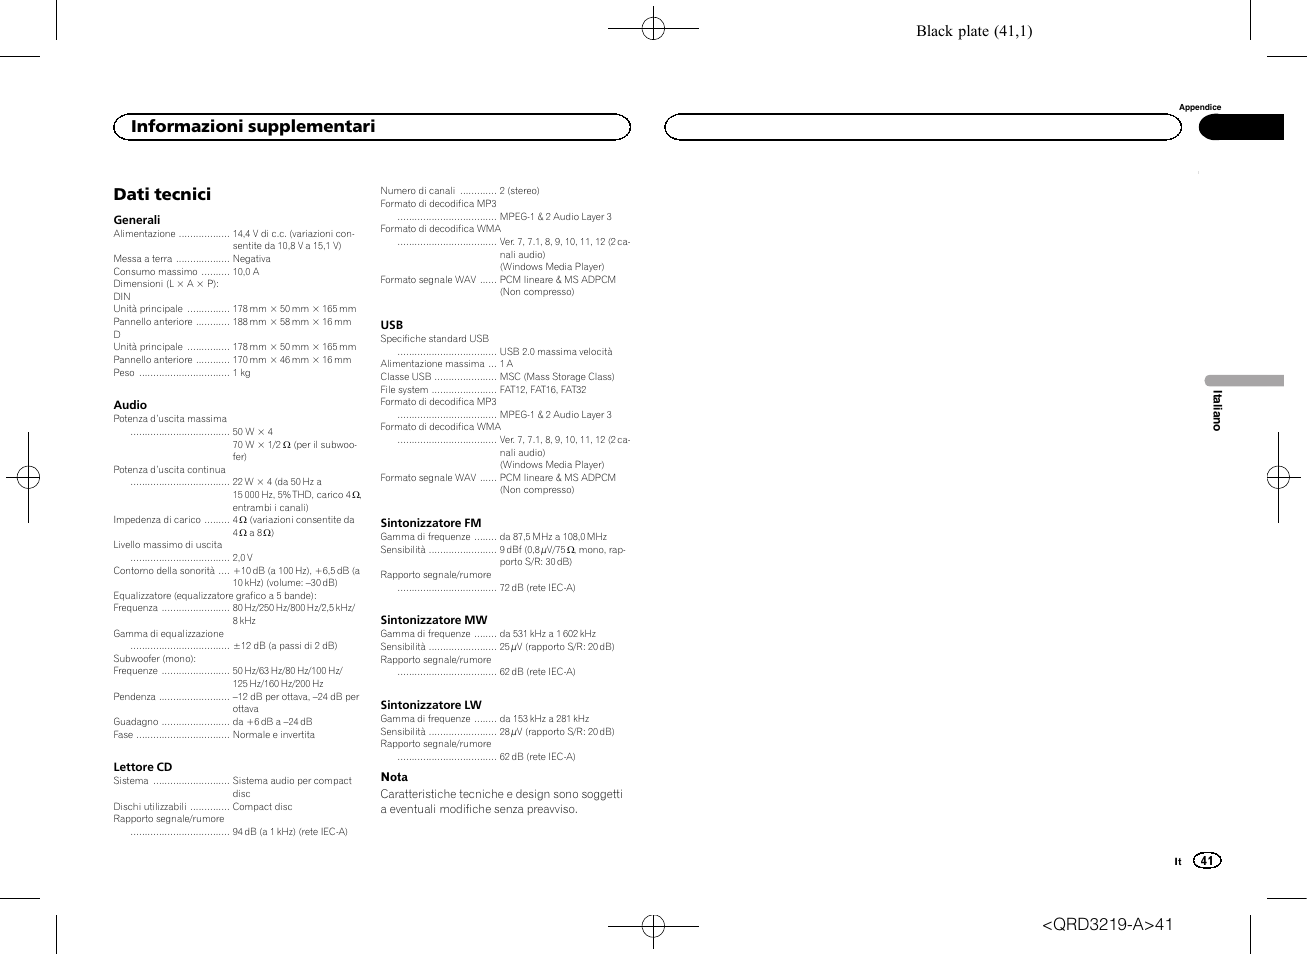 Dati tecnici, Informazioni supplementari, Black plate (41